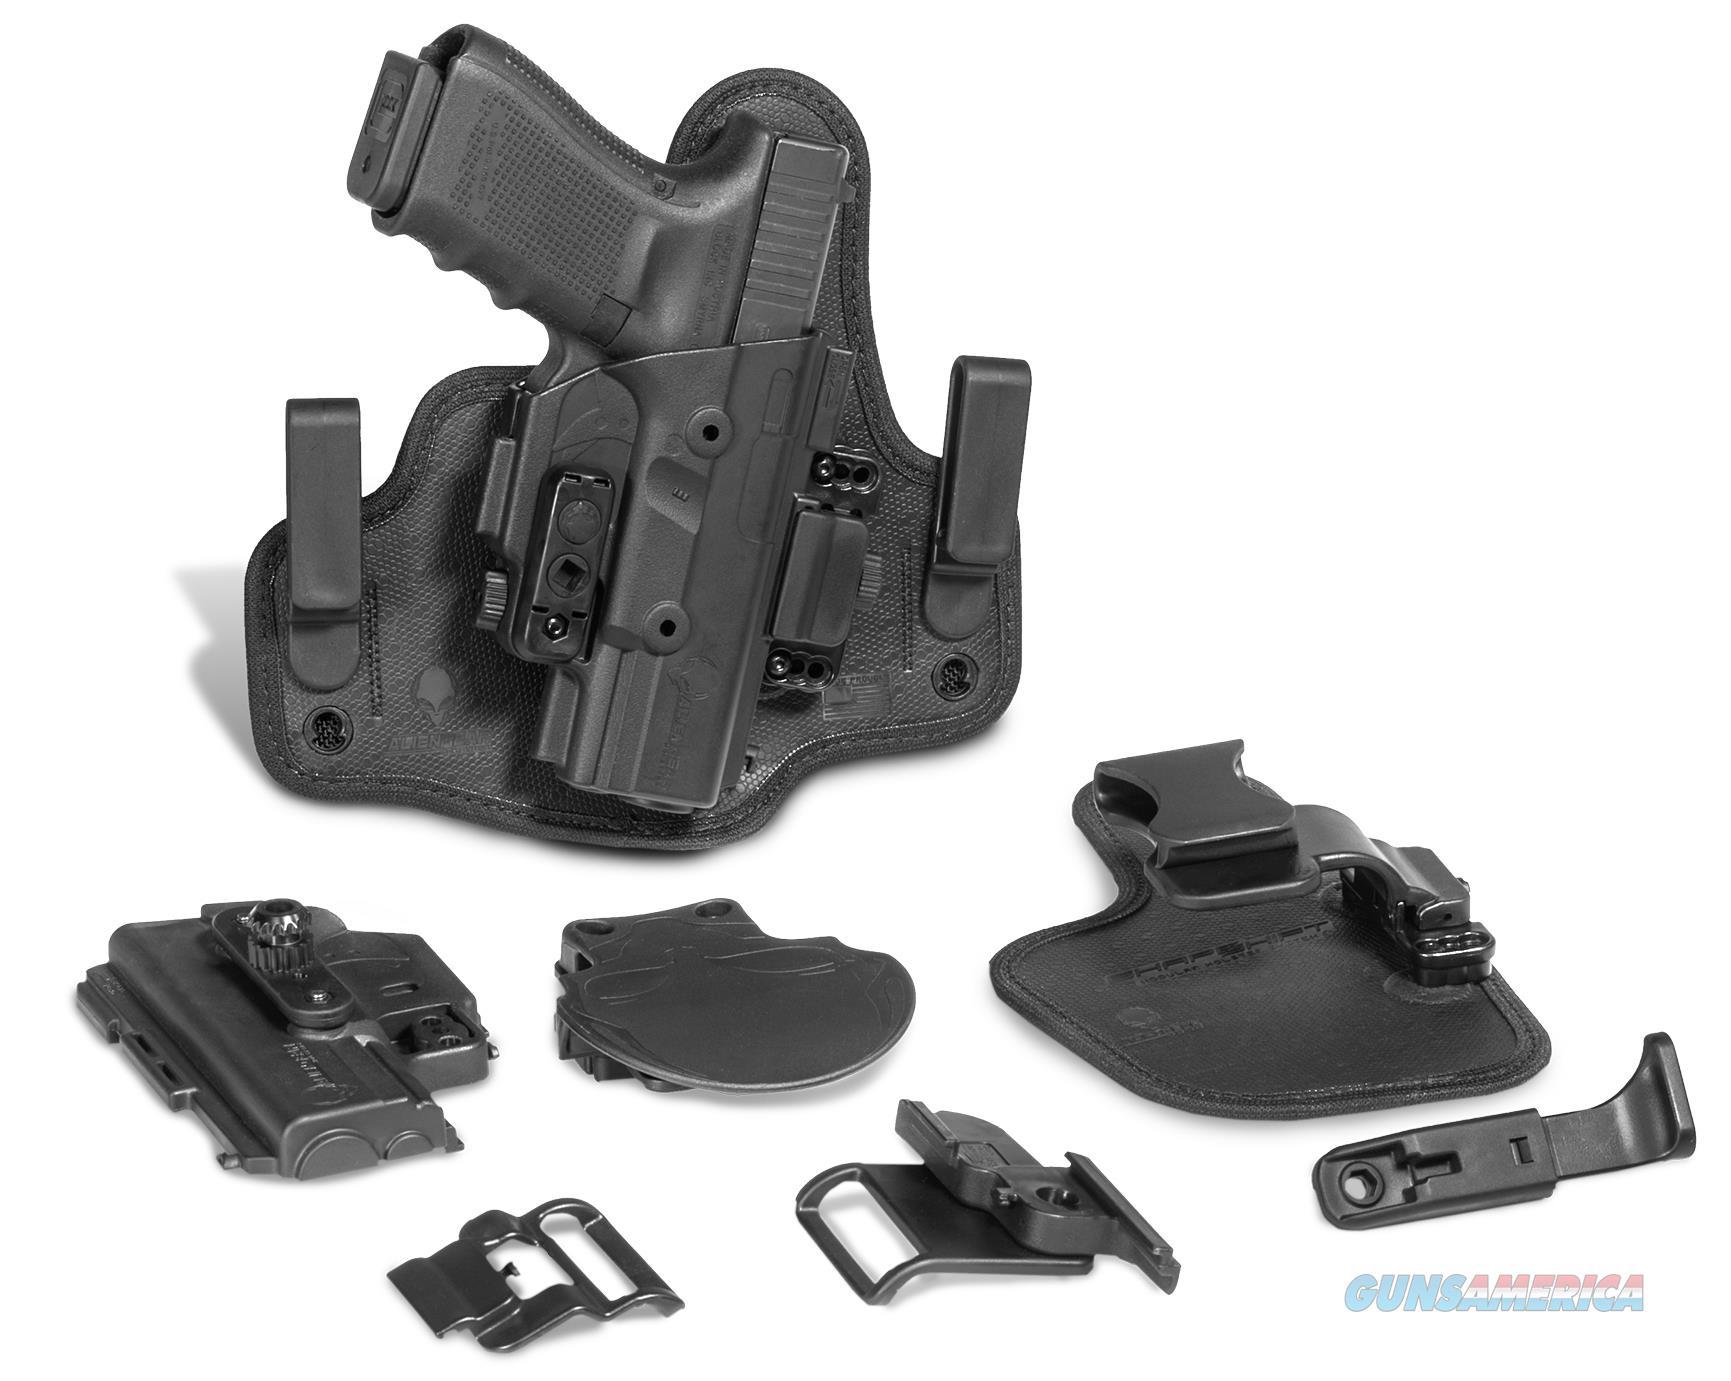 Alien Gear Holsters Shapeshift, Agh Sshk-0062-rh-r-15-xxx Shape Shift Kit Gl23  Guns > Pistols > 1911 Pistol Copies (non-Colt)